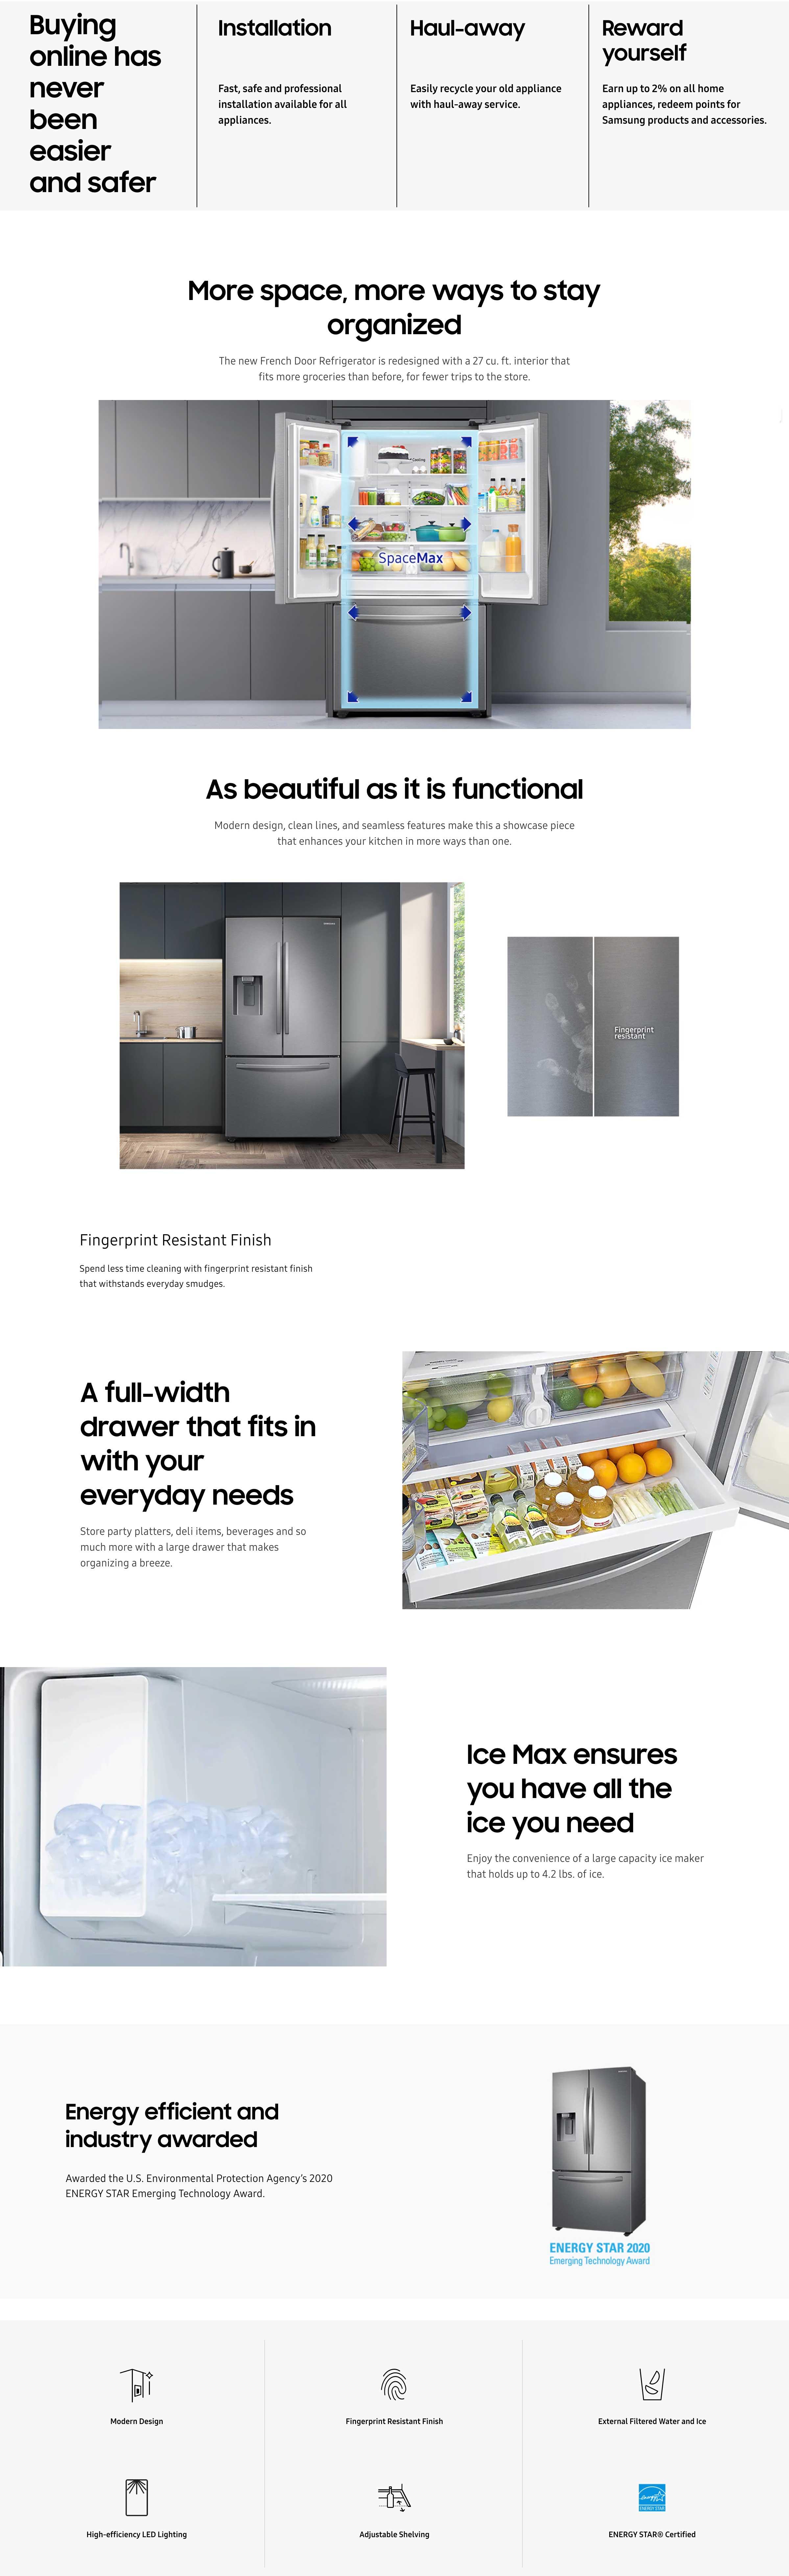 screencapture-samsung-us-home-appliances-refrigerators-3-door-french-door-27-cu-ft-large-capacity-3-door-french-door-refrigerator-with-external-water-ice-dispenser-in-stainless-steel-rf27t5201sr-aa-2020-09-18-15-15-13.jpg